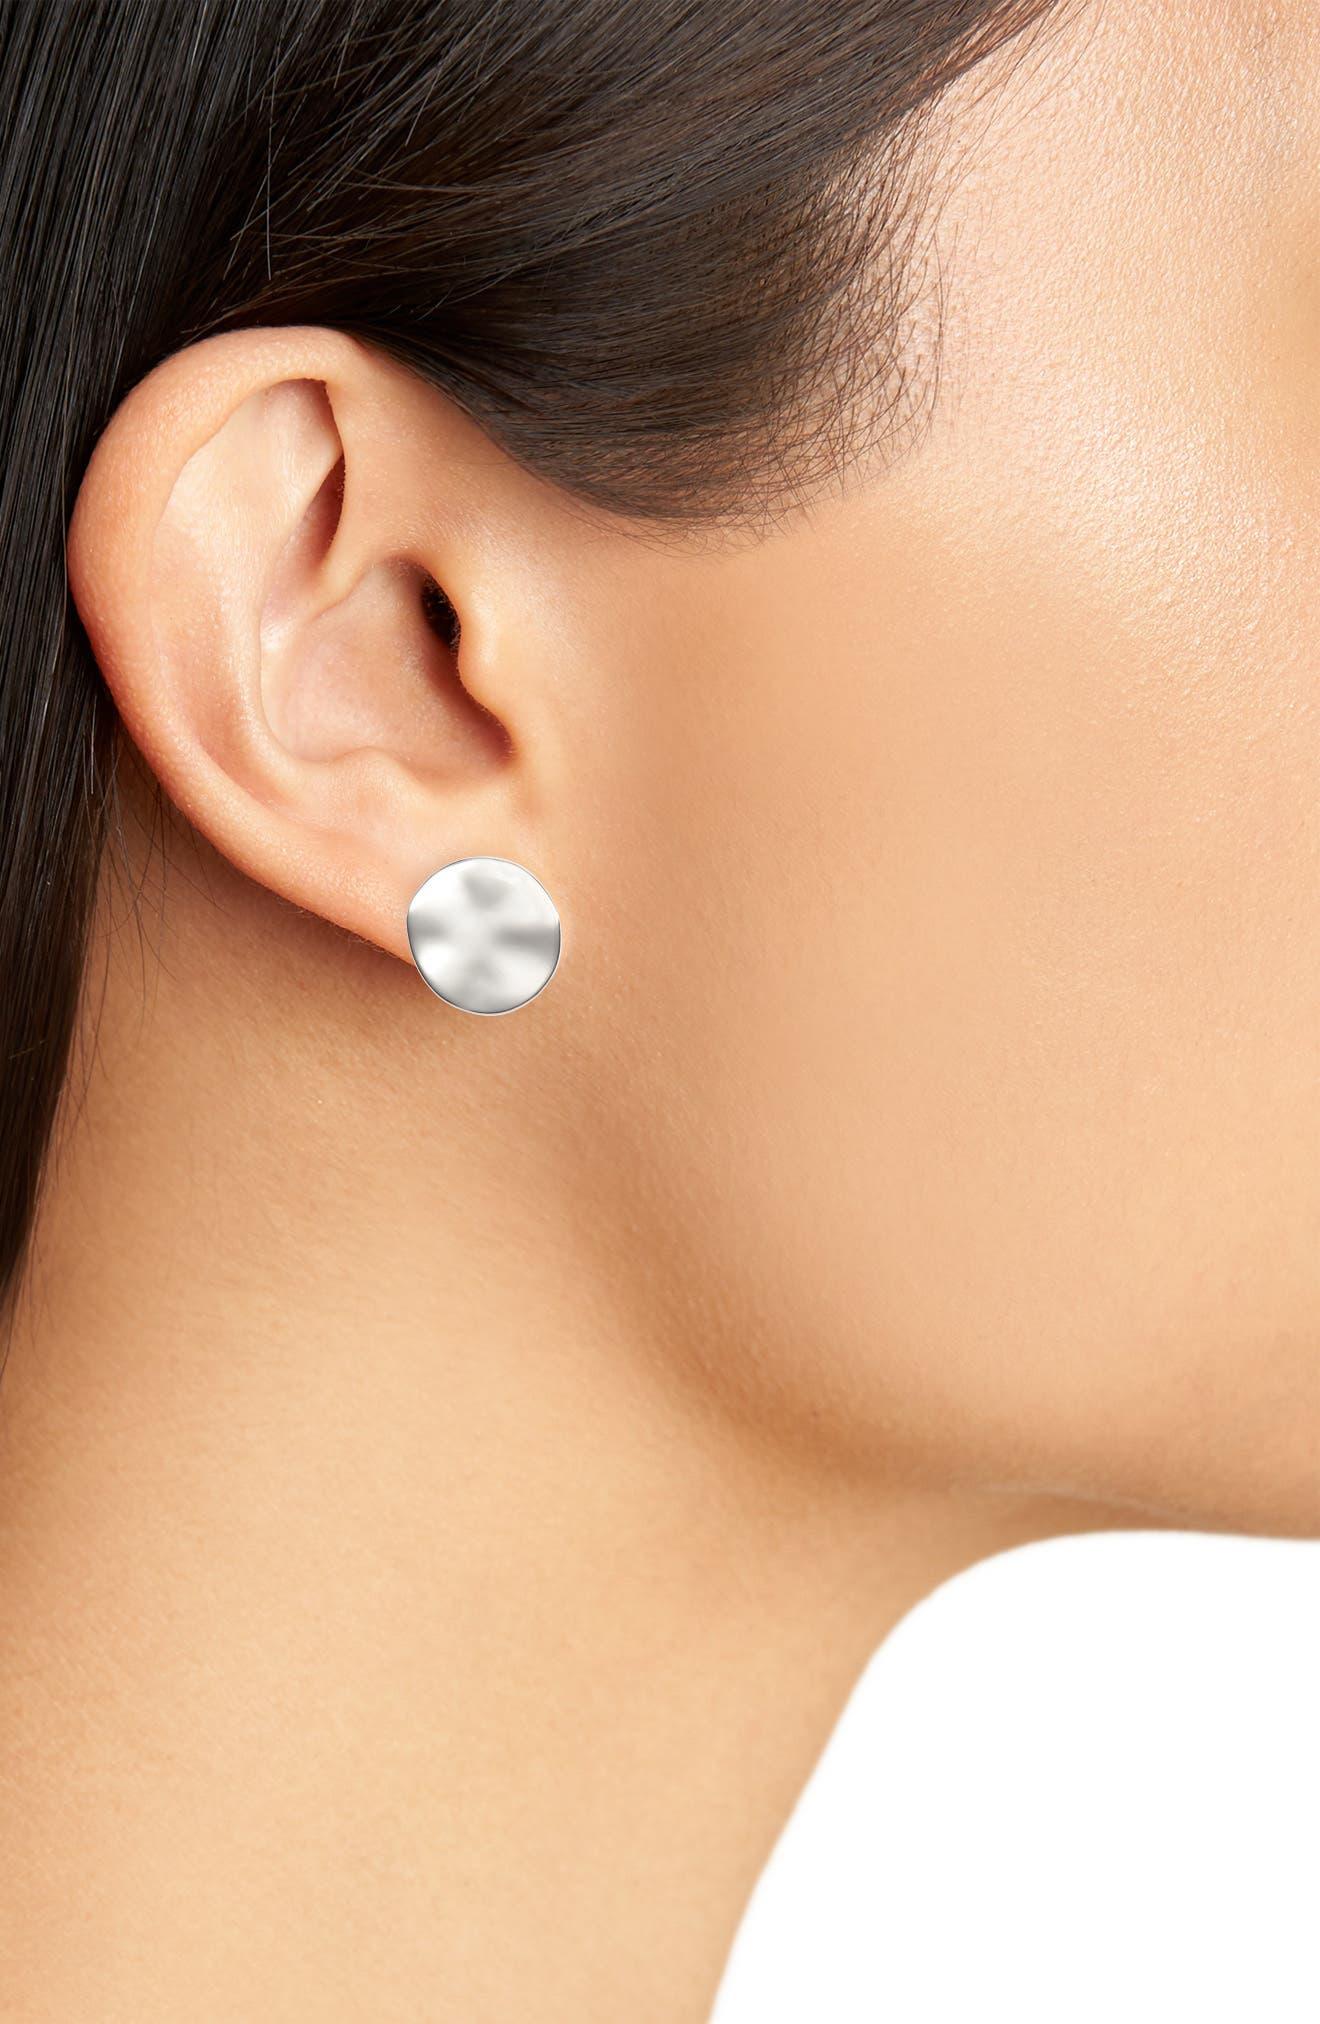 Chloe Large Stud Earrings,                             Alternate thumbnail 2, color,                             SILVER